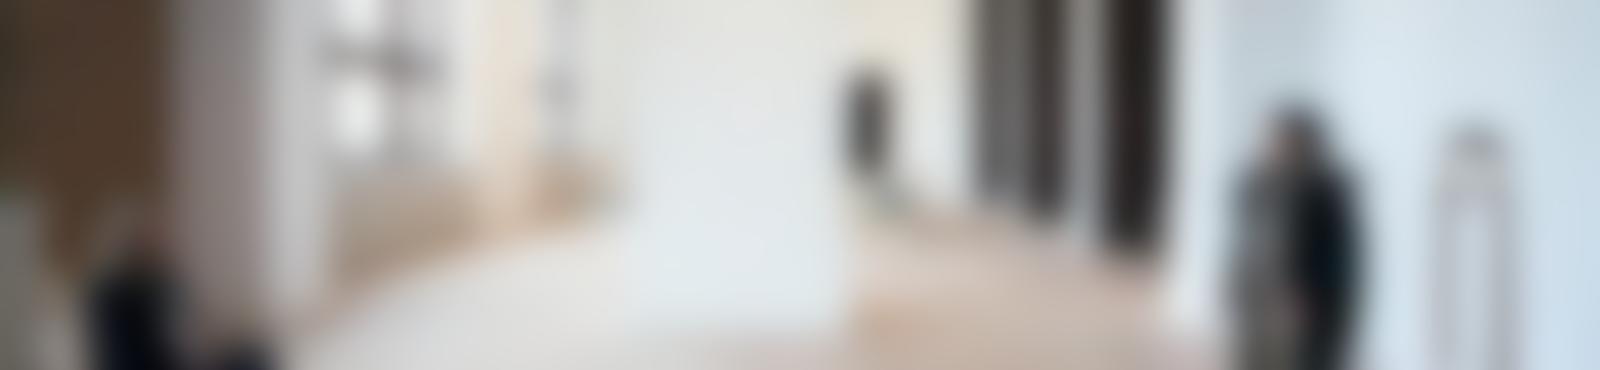 Blurred 794d3c7d d642 4a24 ab22 308c043c1397